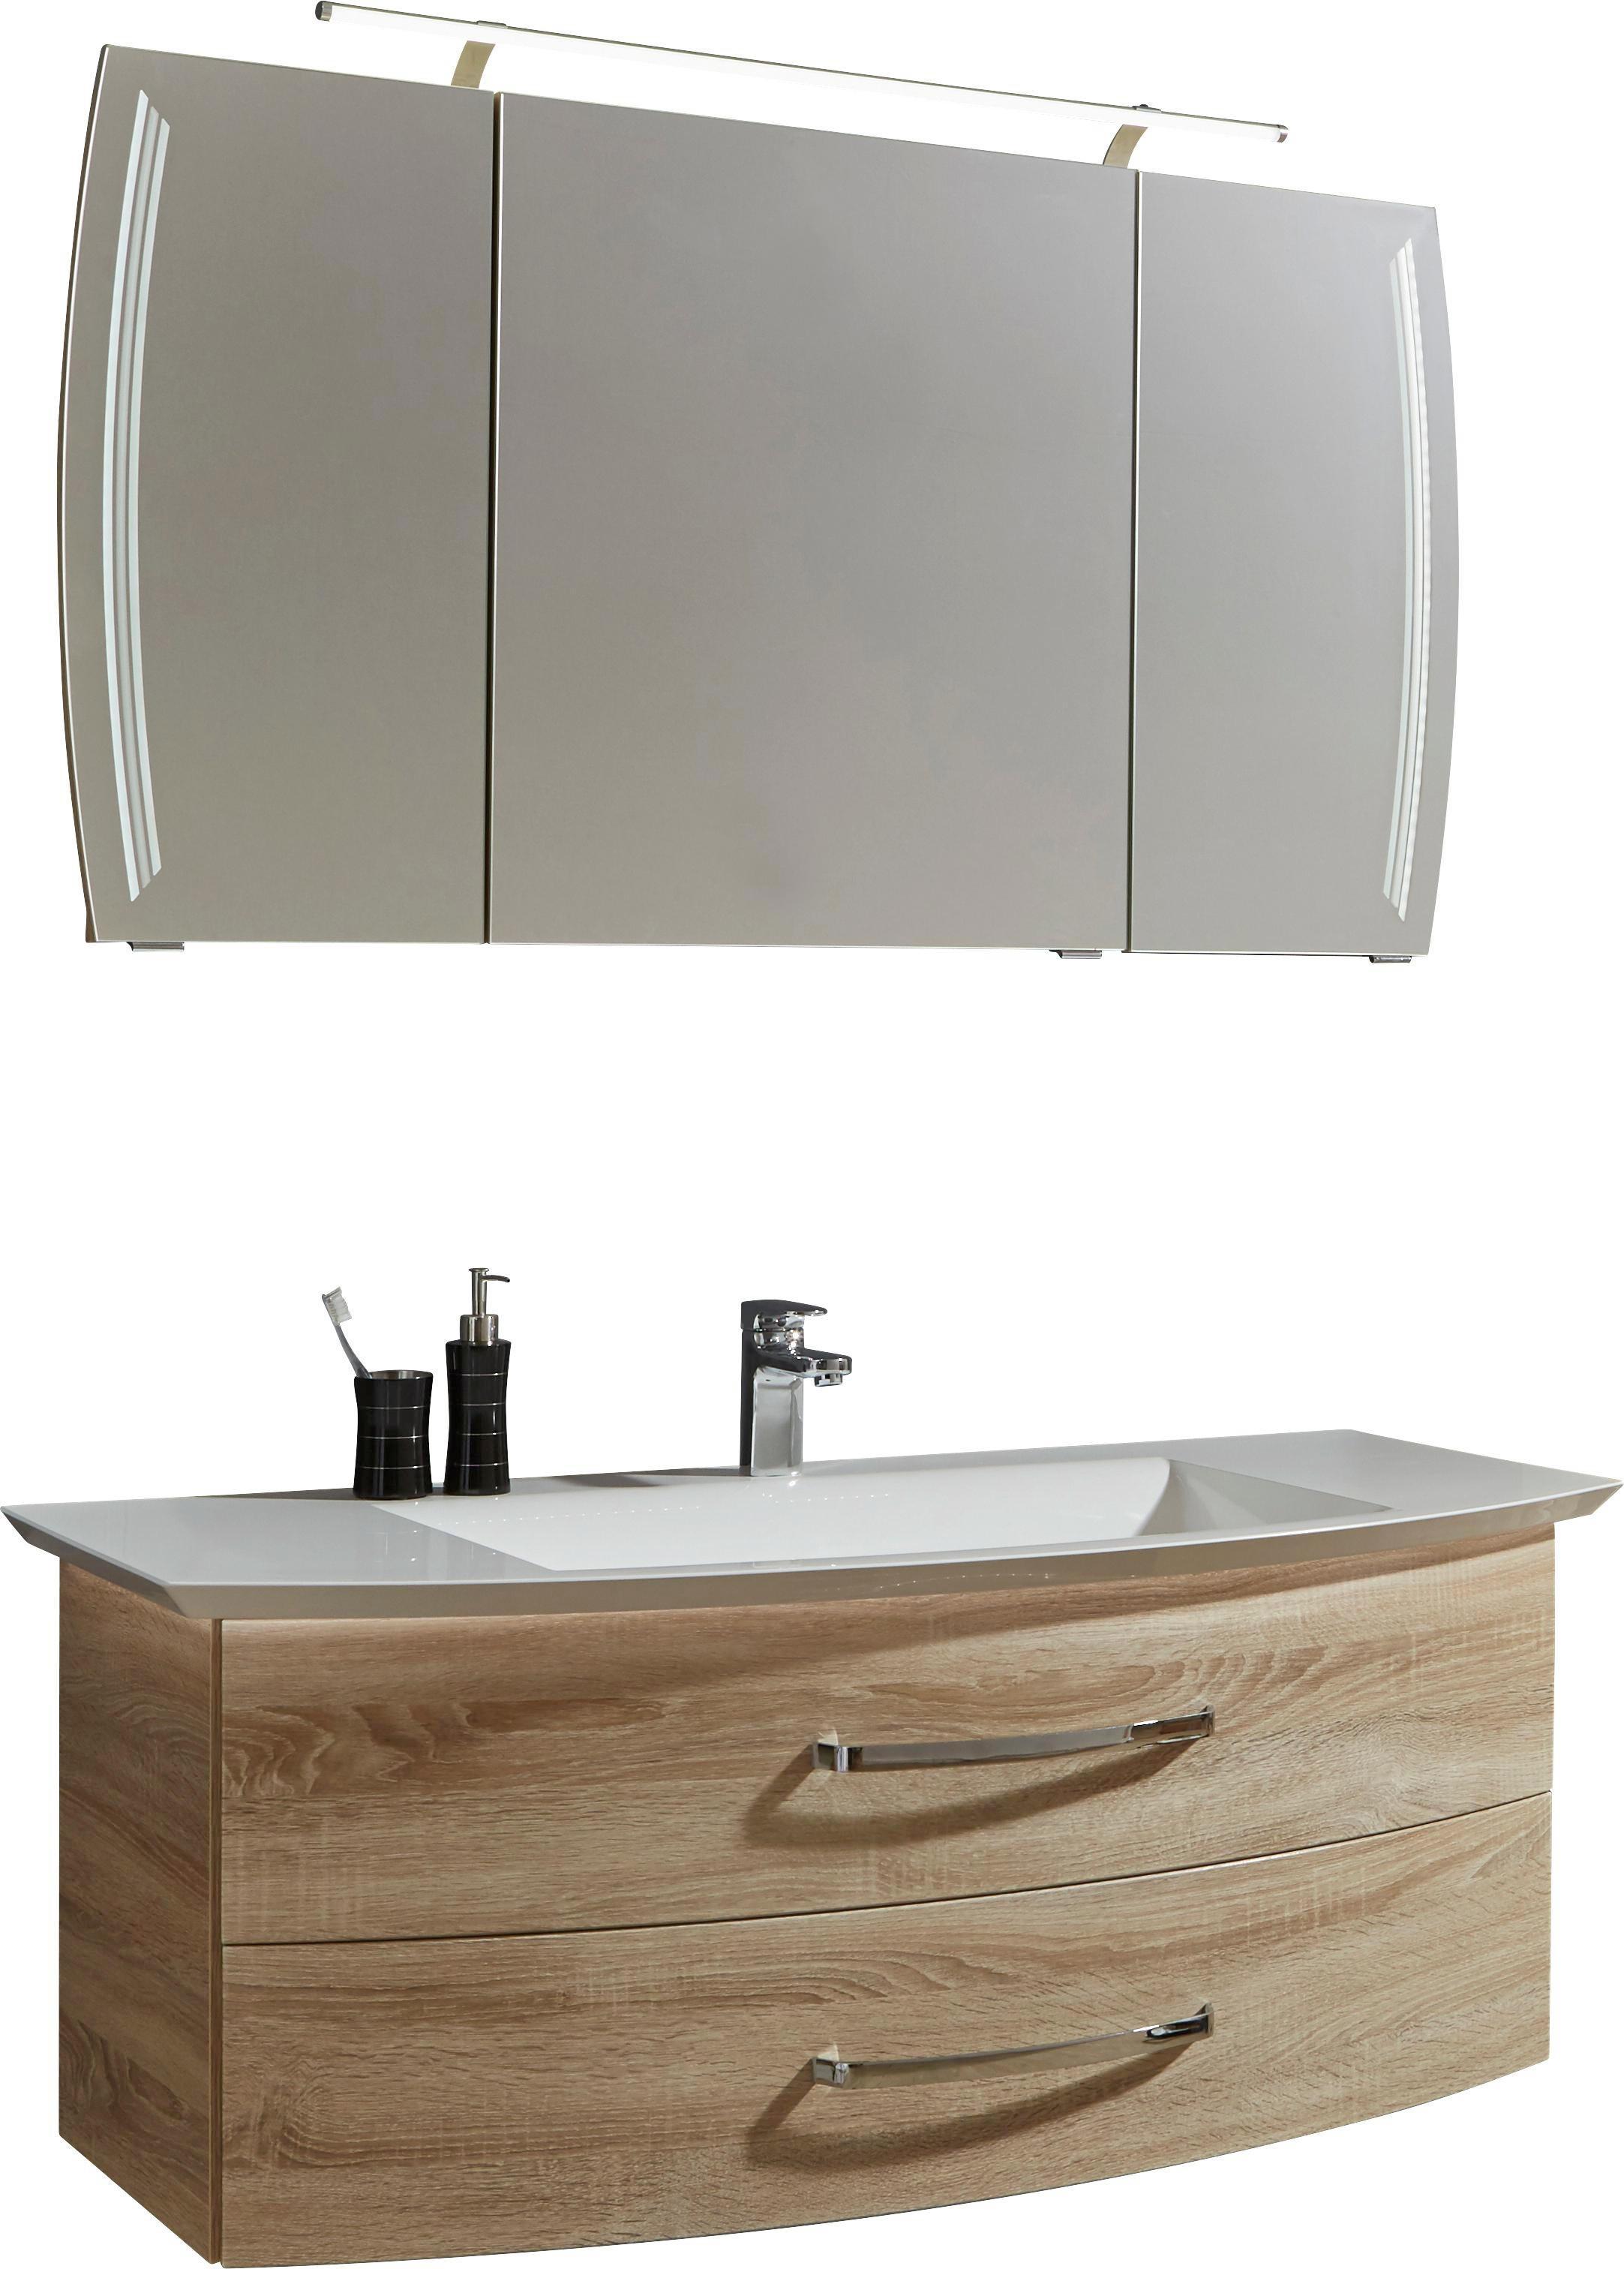 KOPALNICA - barve hrasta, Design, steklo/leseni material (130cm) - DIETER KNOLL